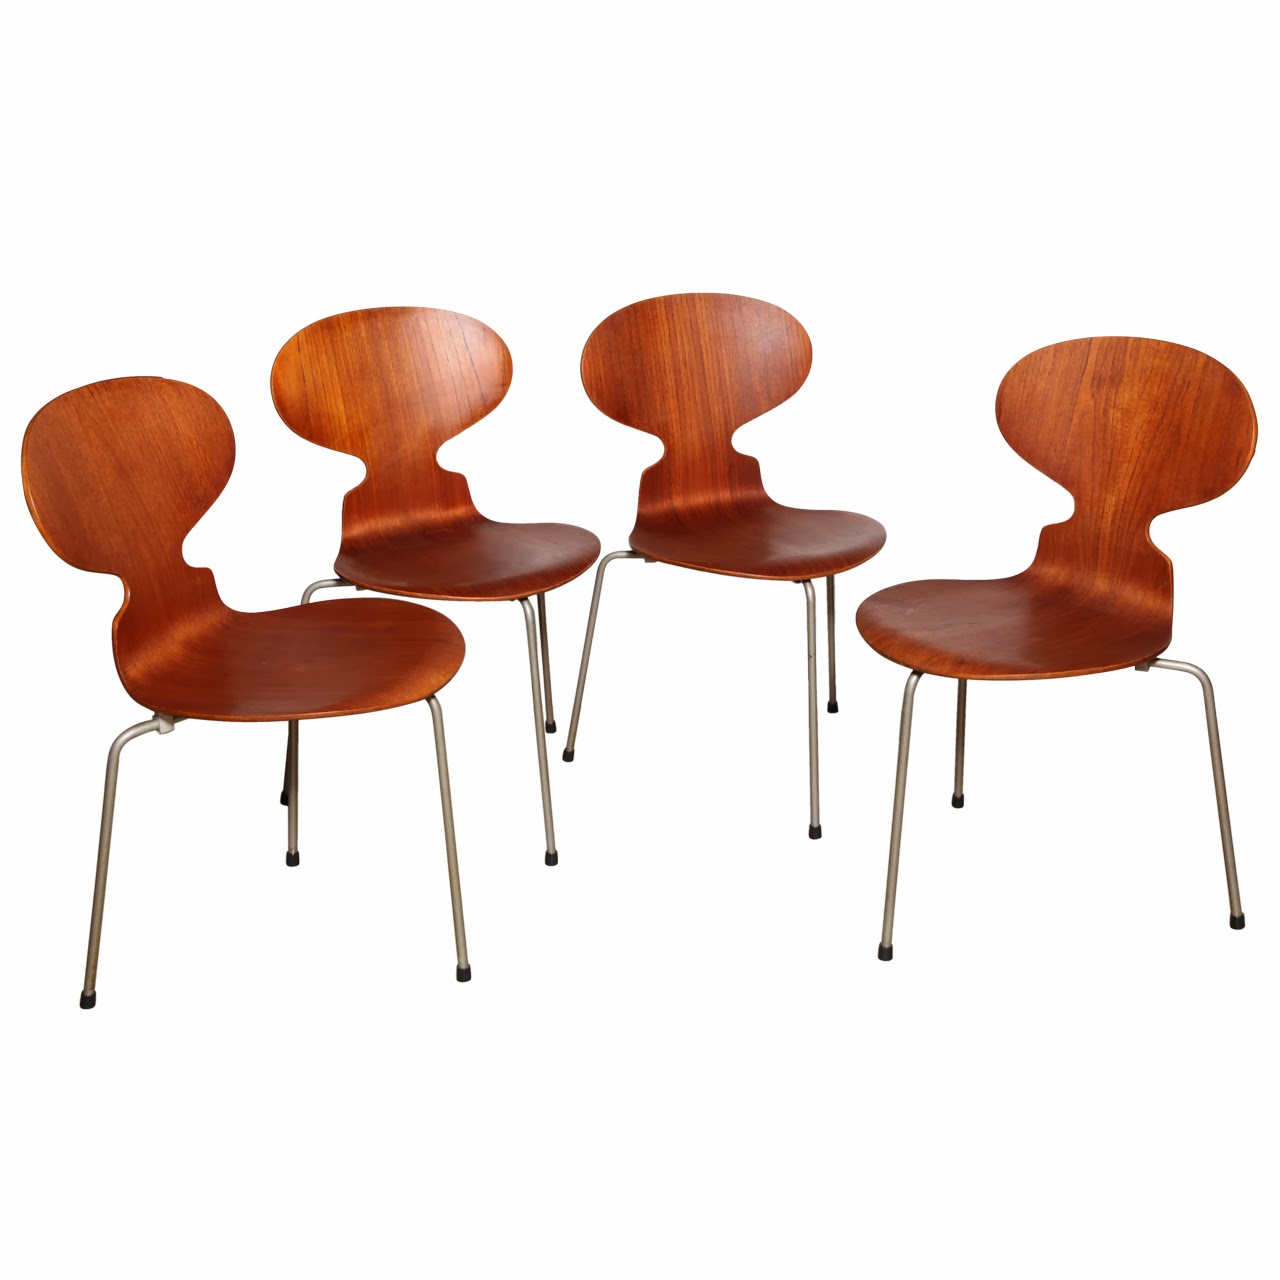 vernon panton chair used kitchen chairs os rebeldes anos 60 larissa carbone arquitetura